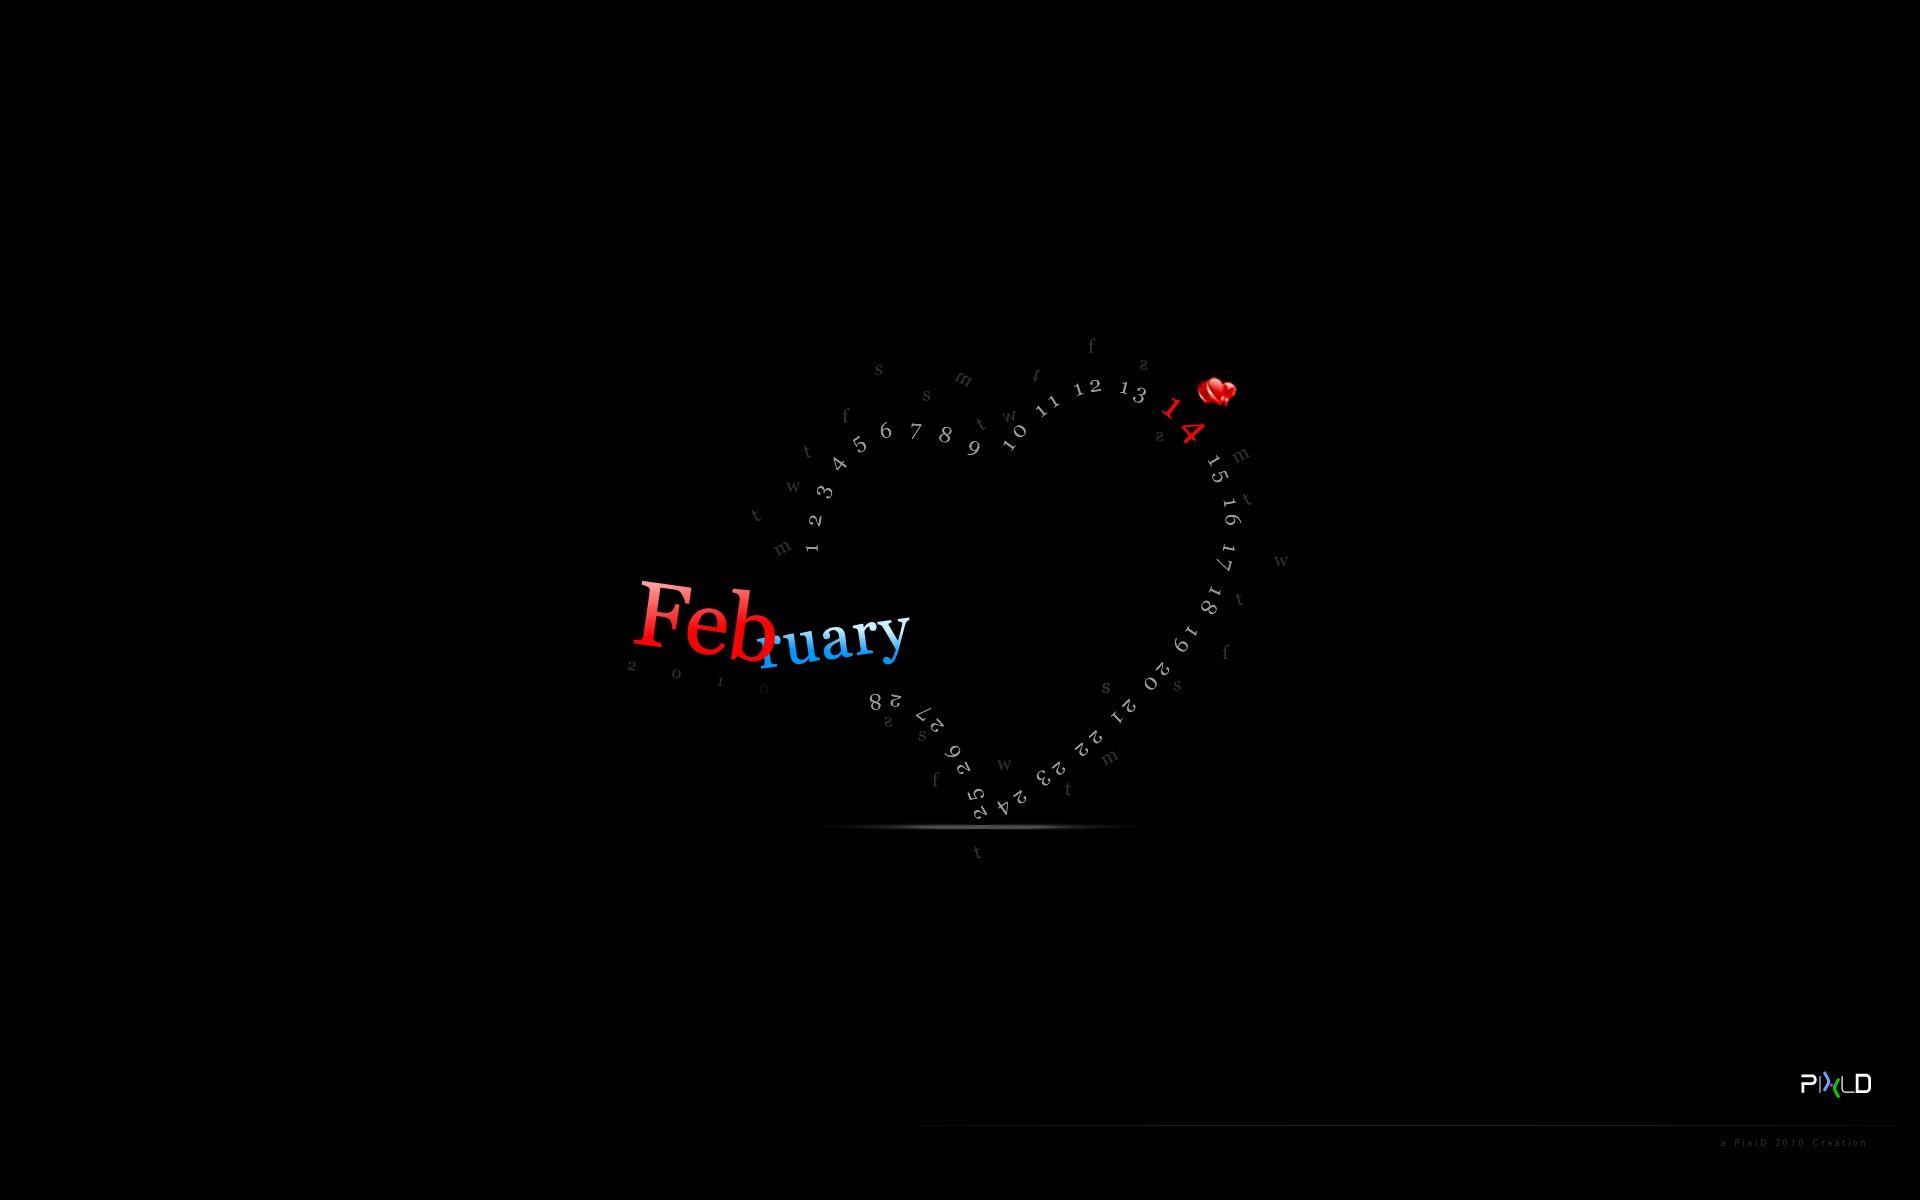 desktop wallpaper valentine wallpapers love black 1920x1200 1920x1200